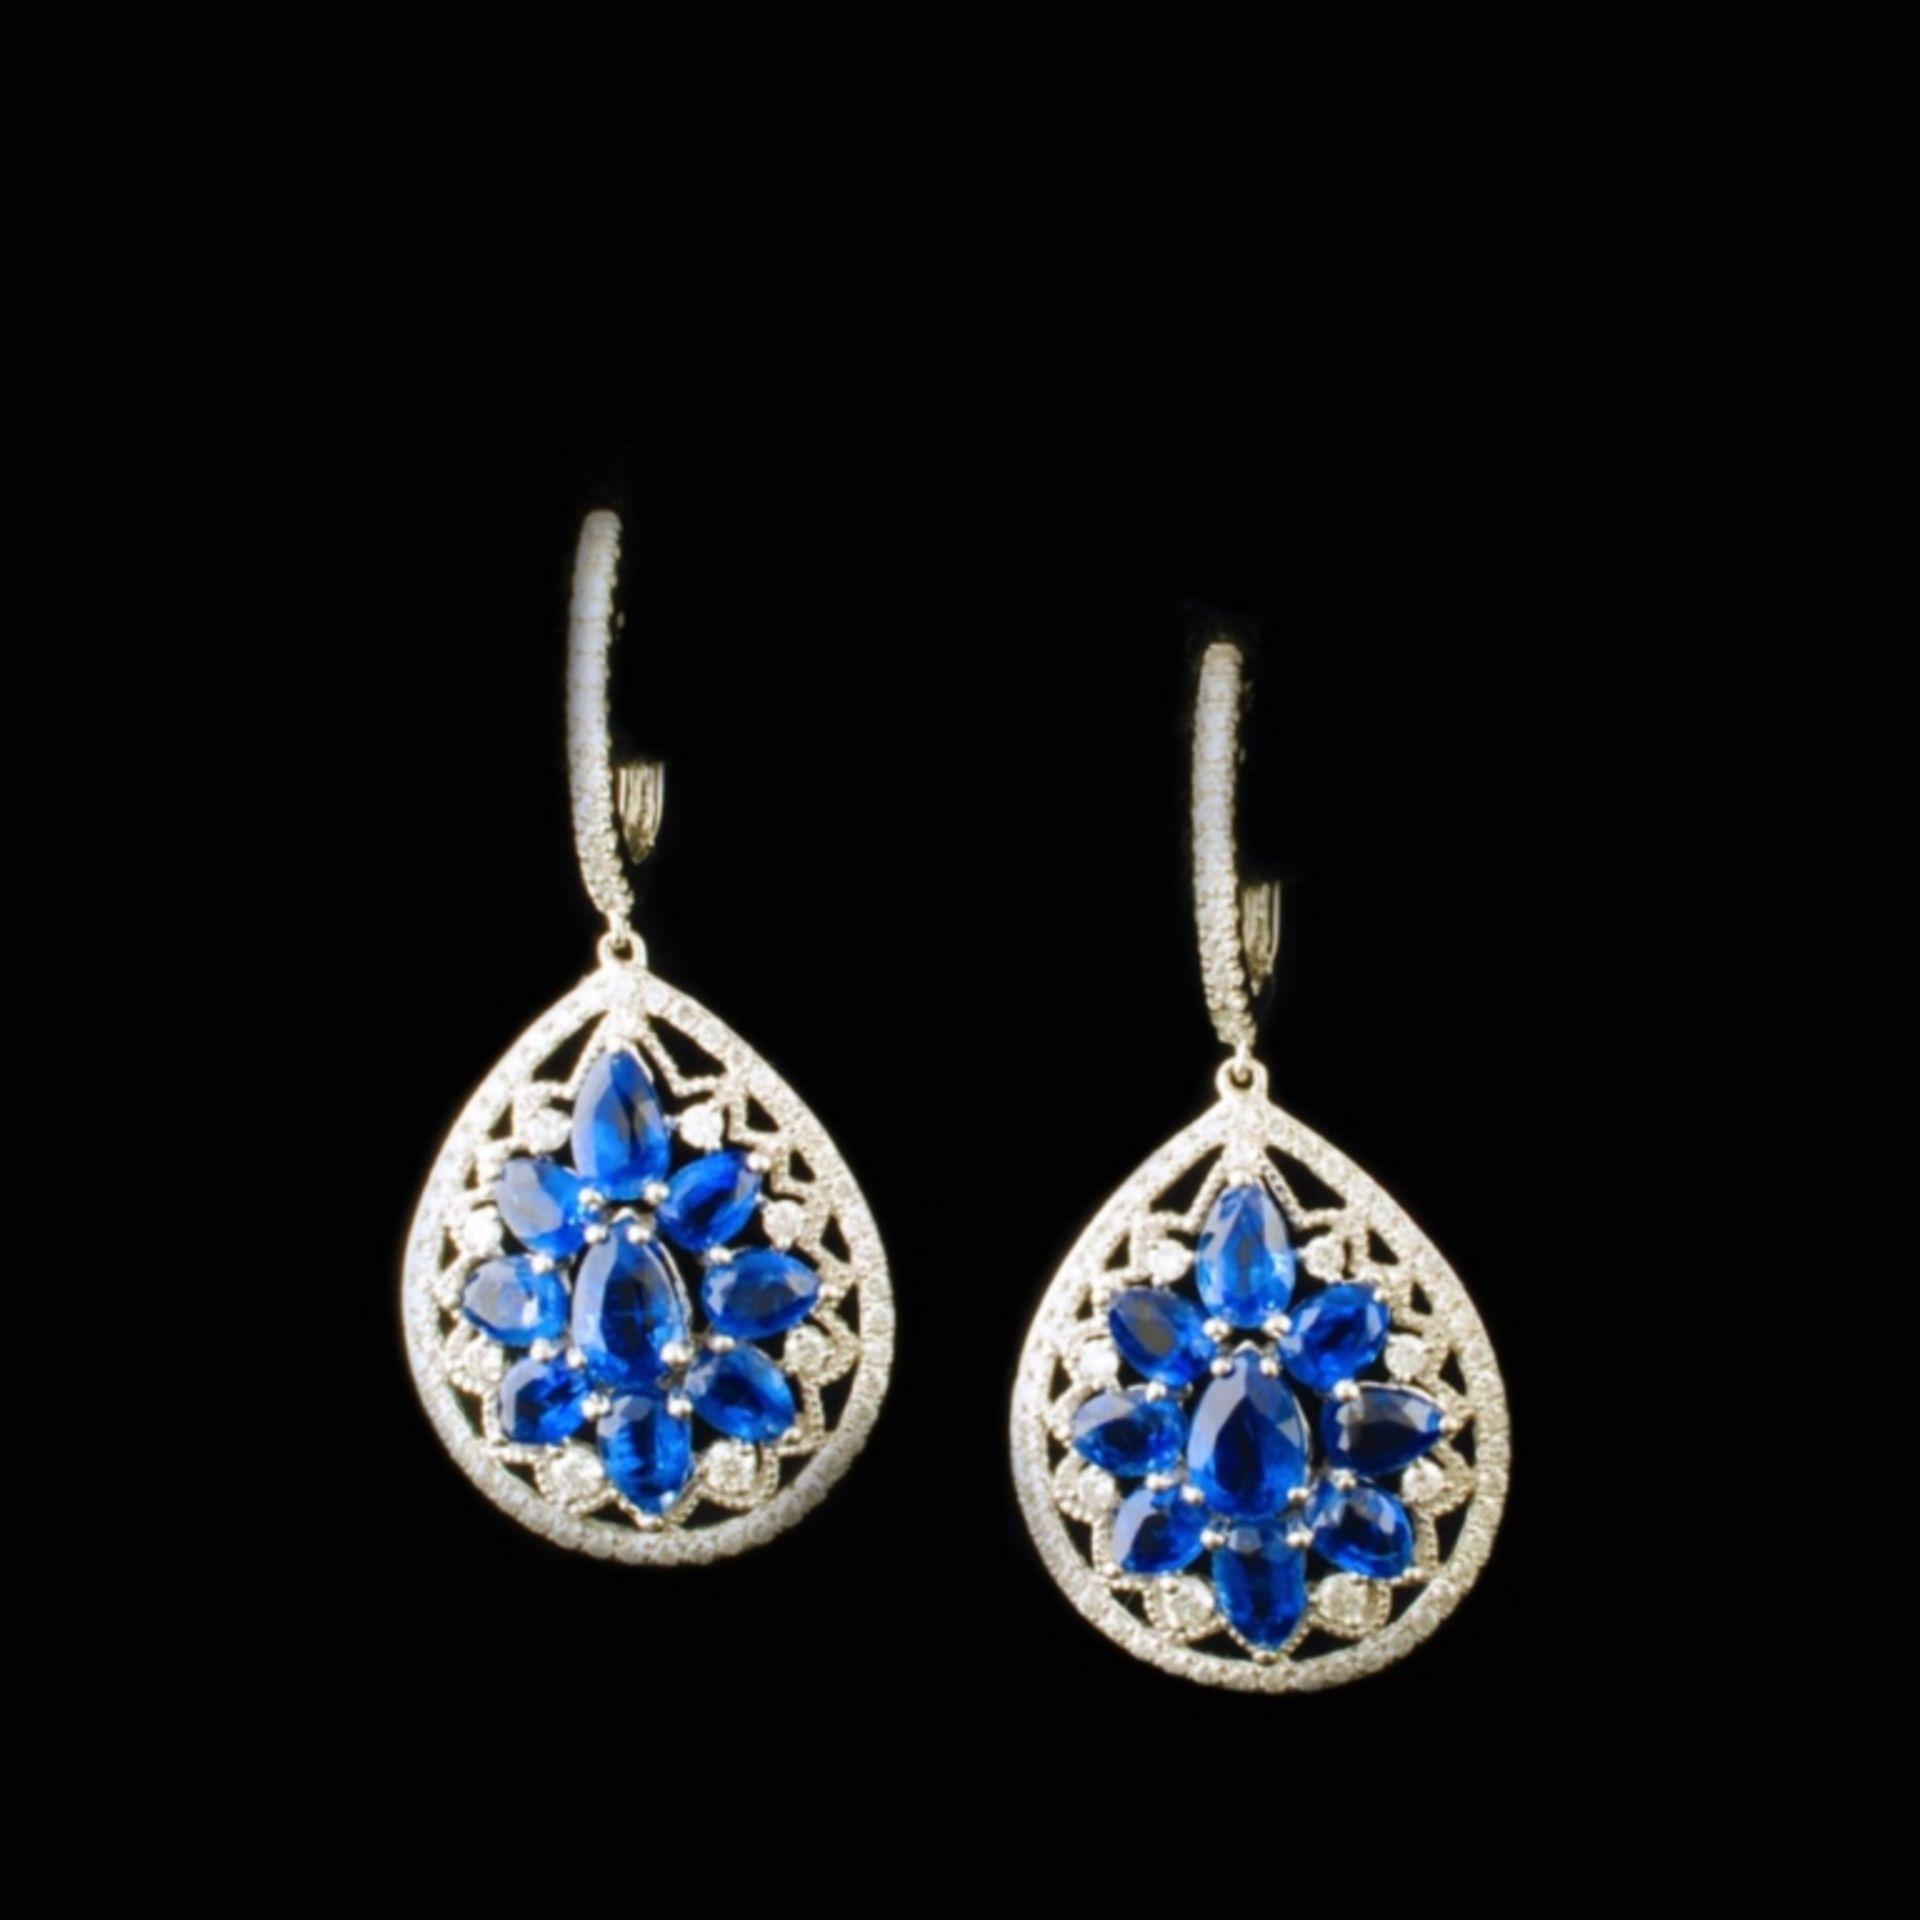 18K White Gold 5.13ct Kyanite & 0.76ctw Diamond Ea - Image 2 of 3